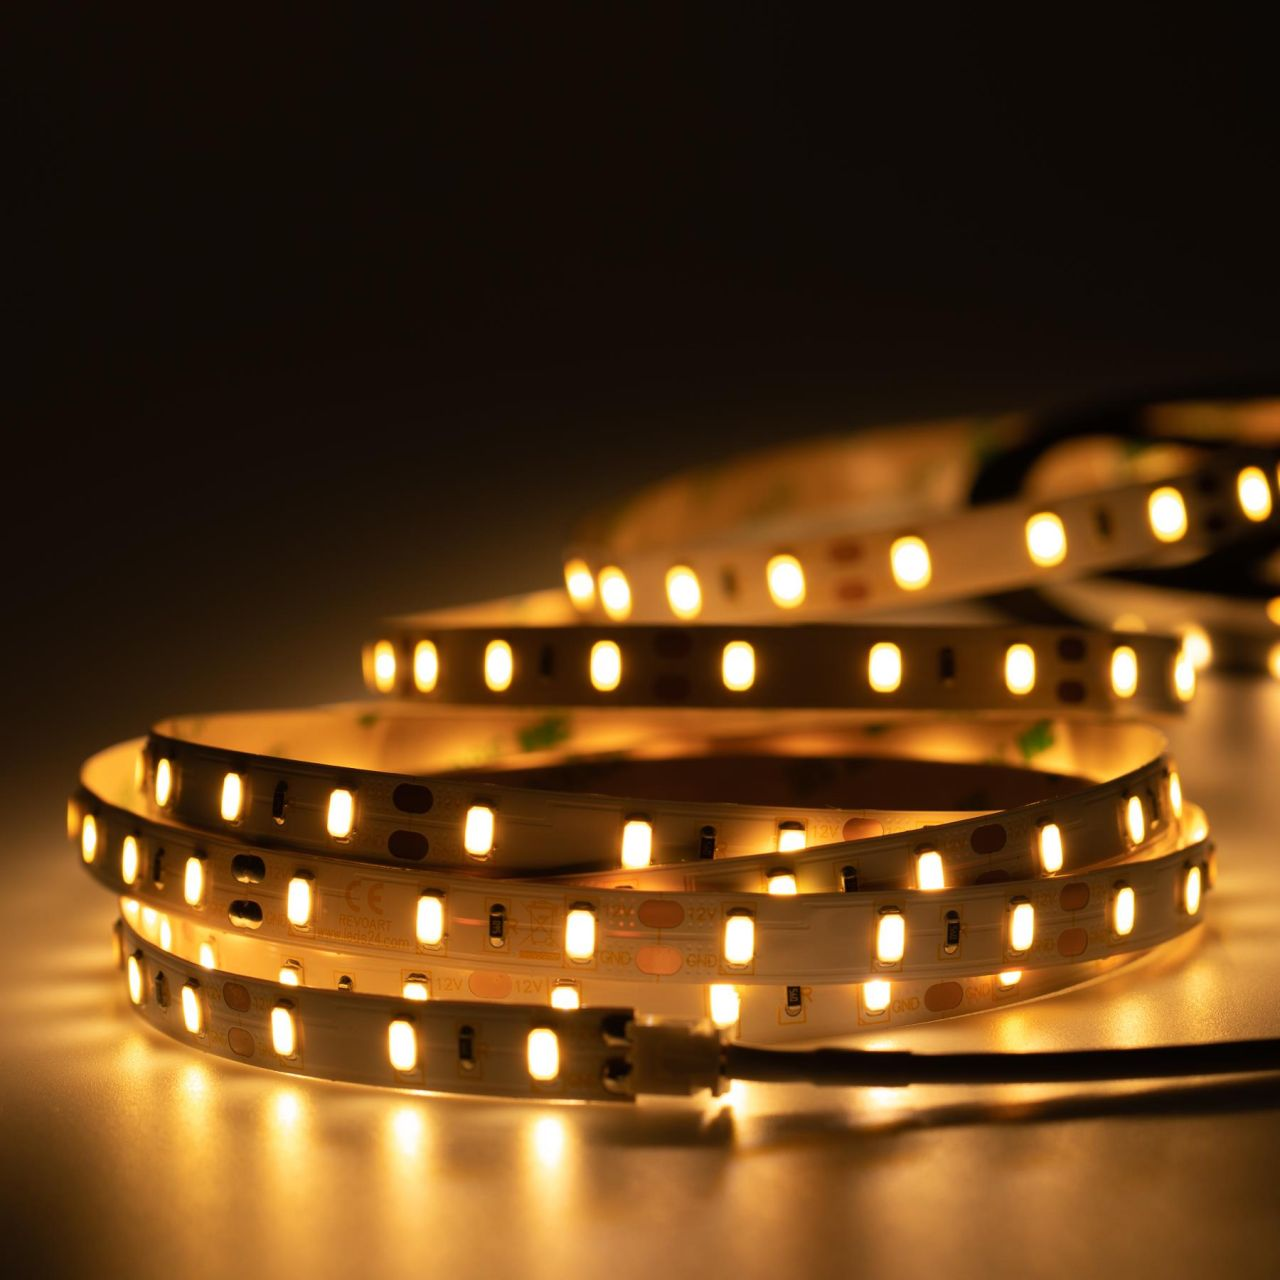 12V High-Power LED Streifen – warmweiß – 60 LEDs je Meter – alle 5cm teilbar